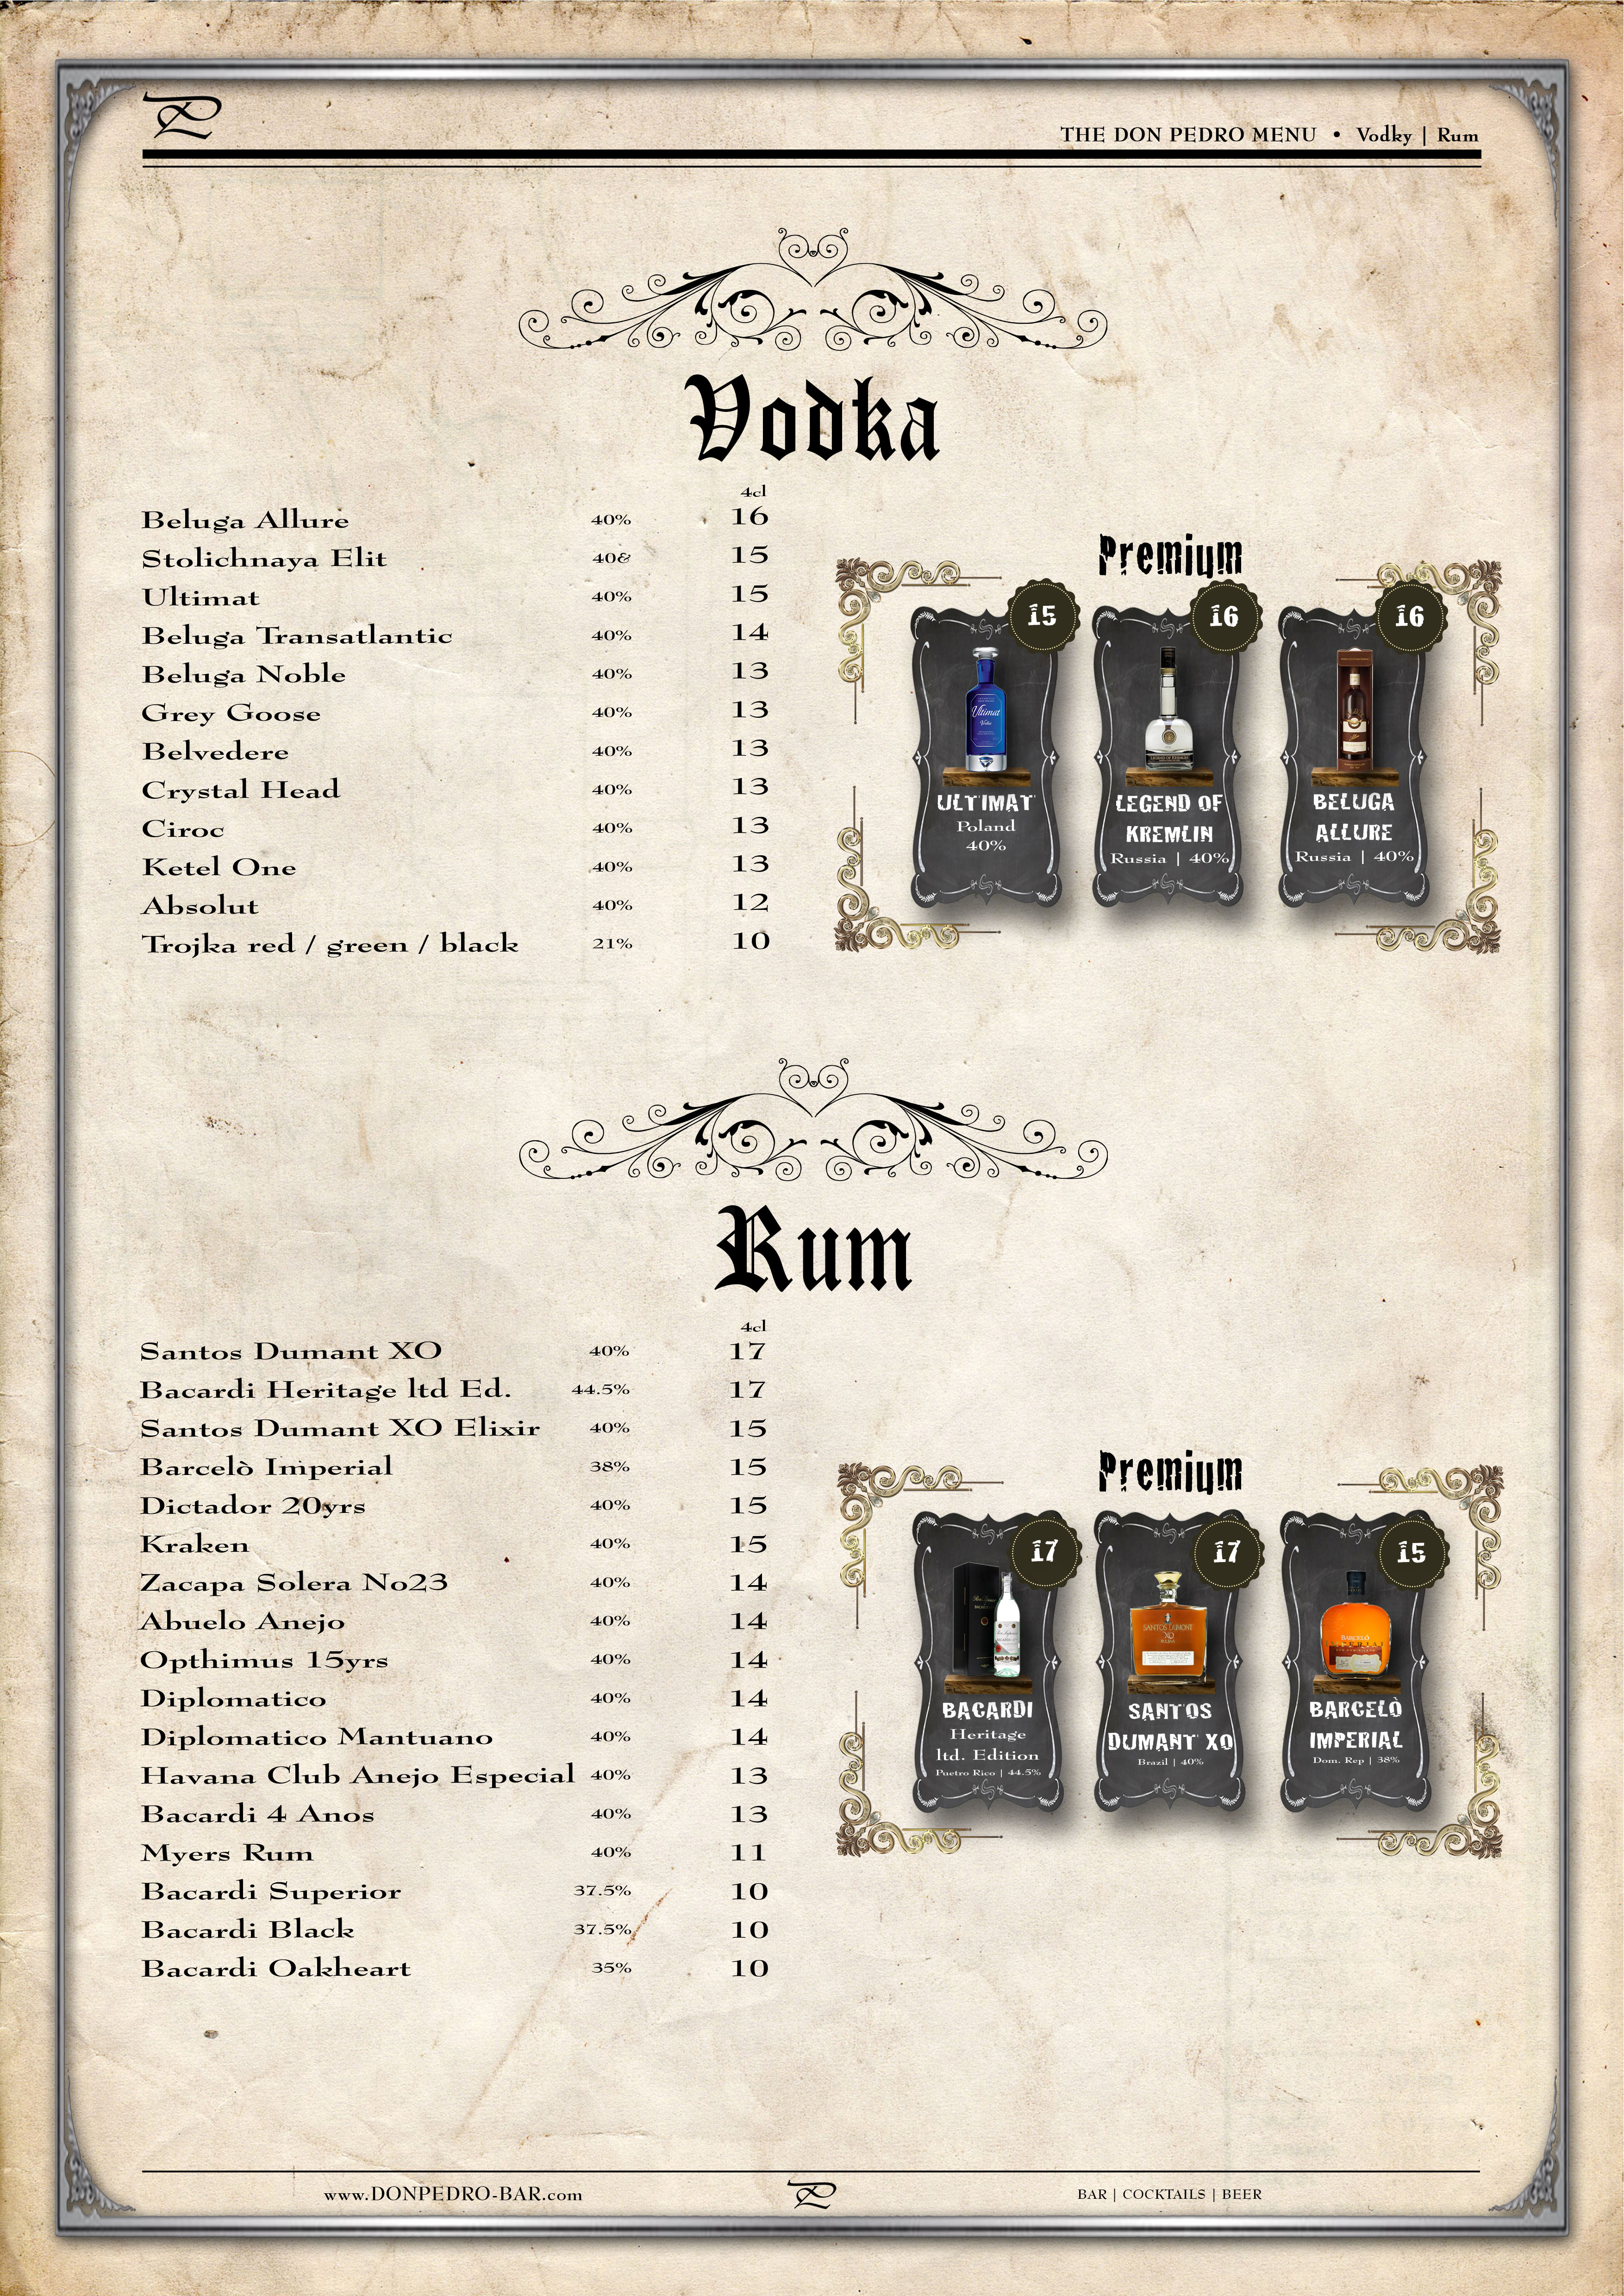 THE DON PEDRO MENU Vodka & Rum